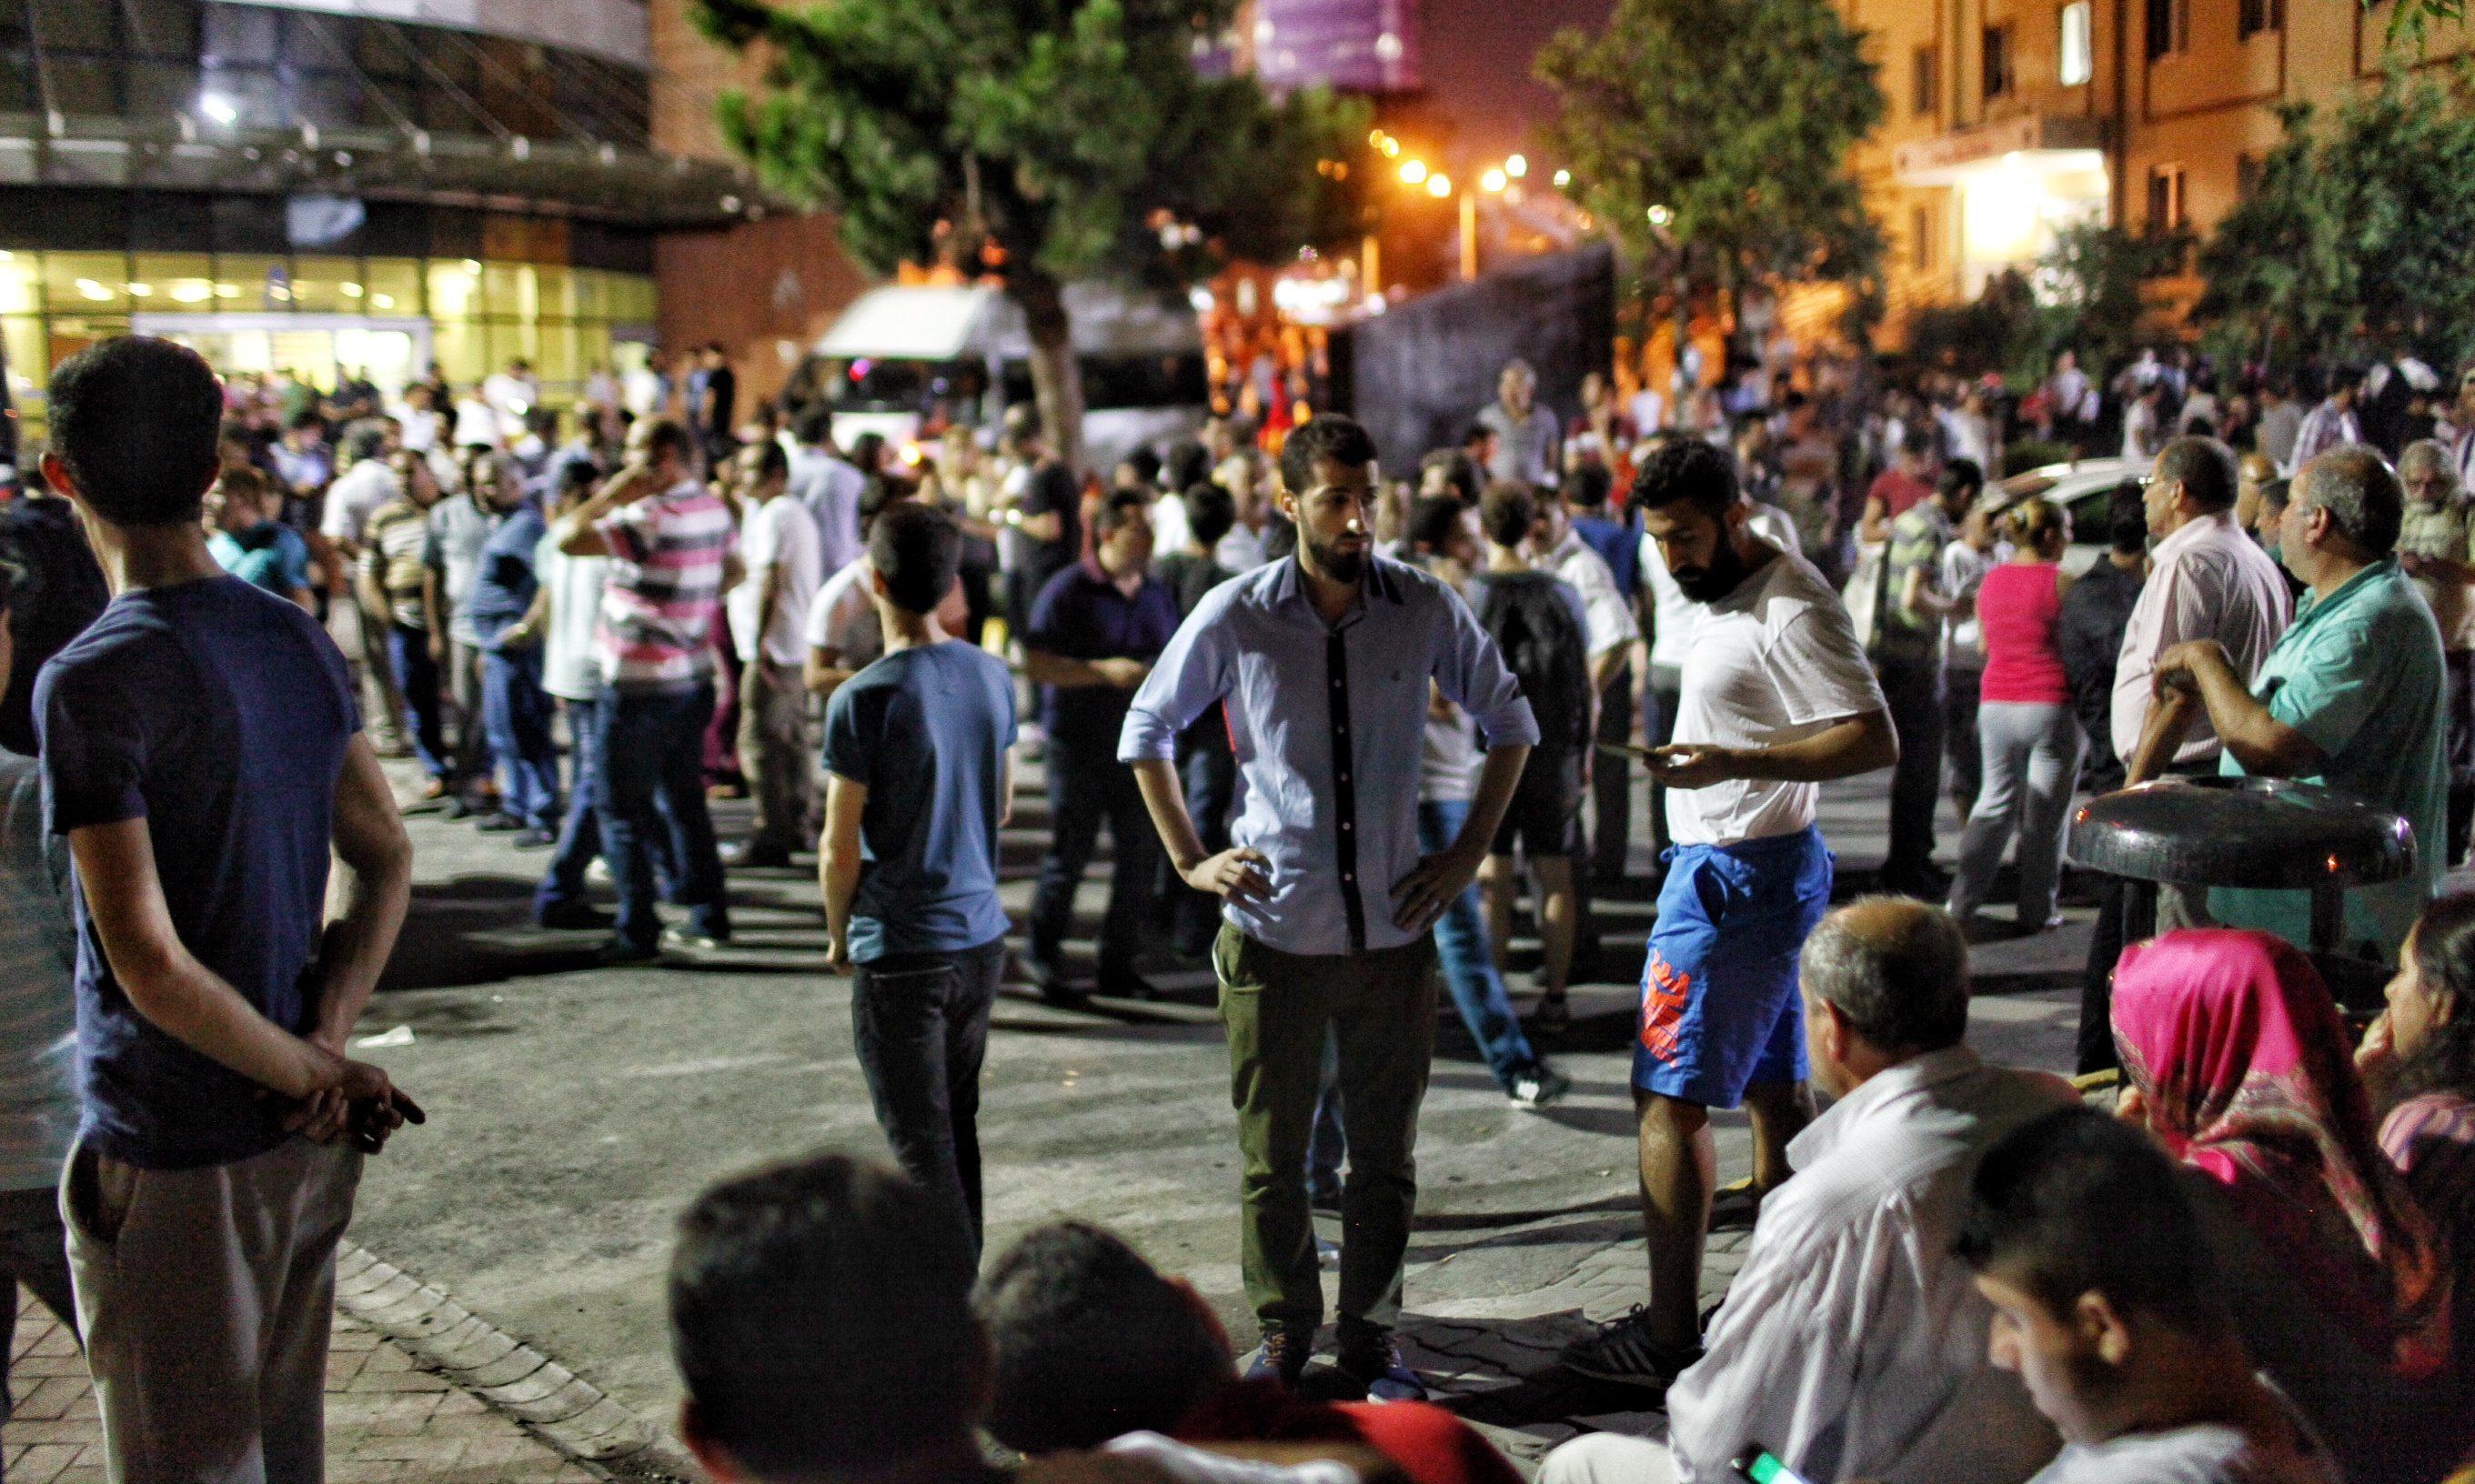 Relatives wait outside Bakirkoy Sadi Konuk Hospital in Istanbul after the airport attack.